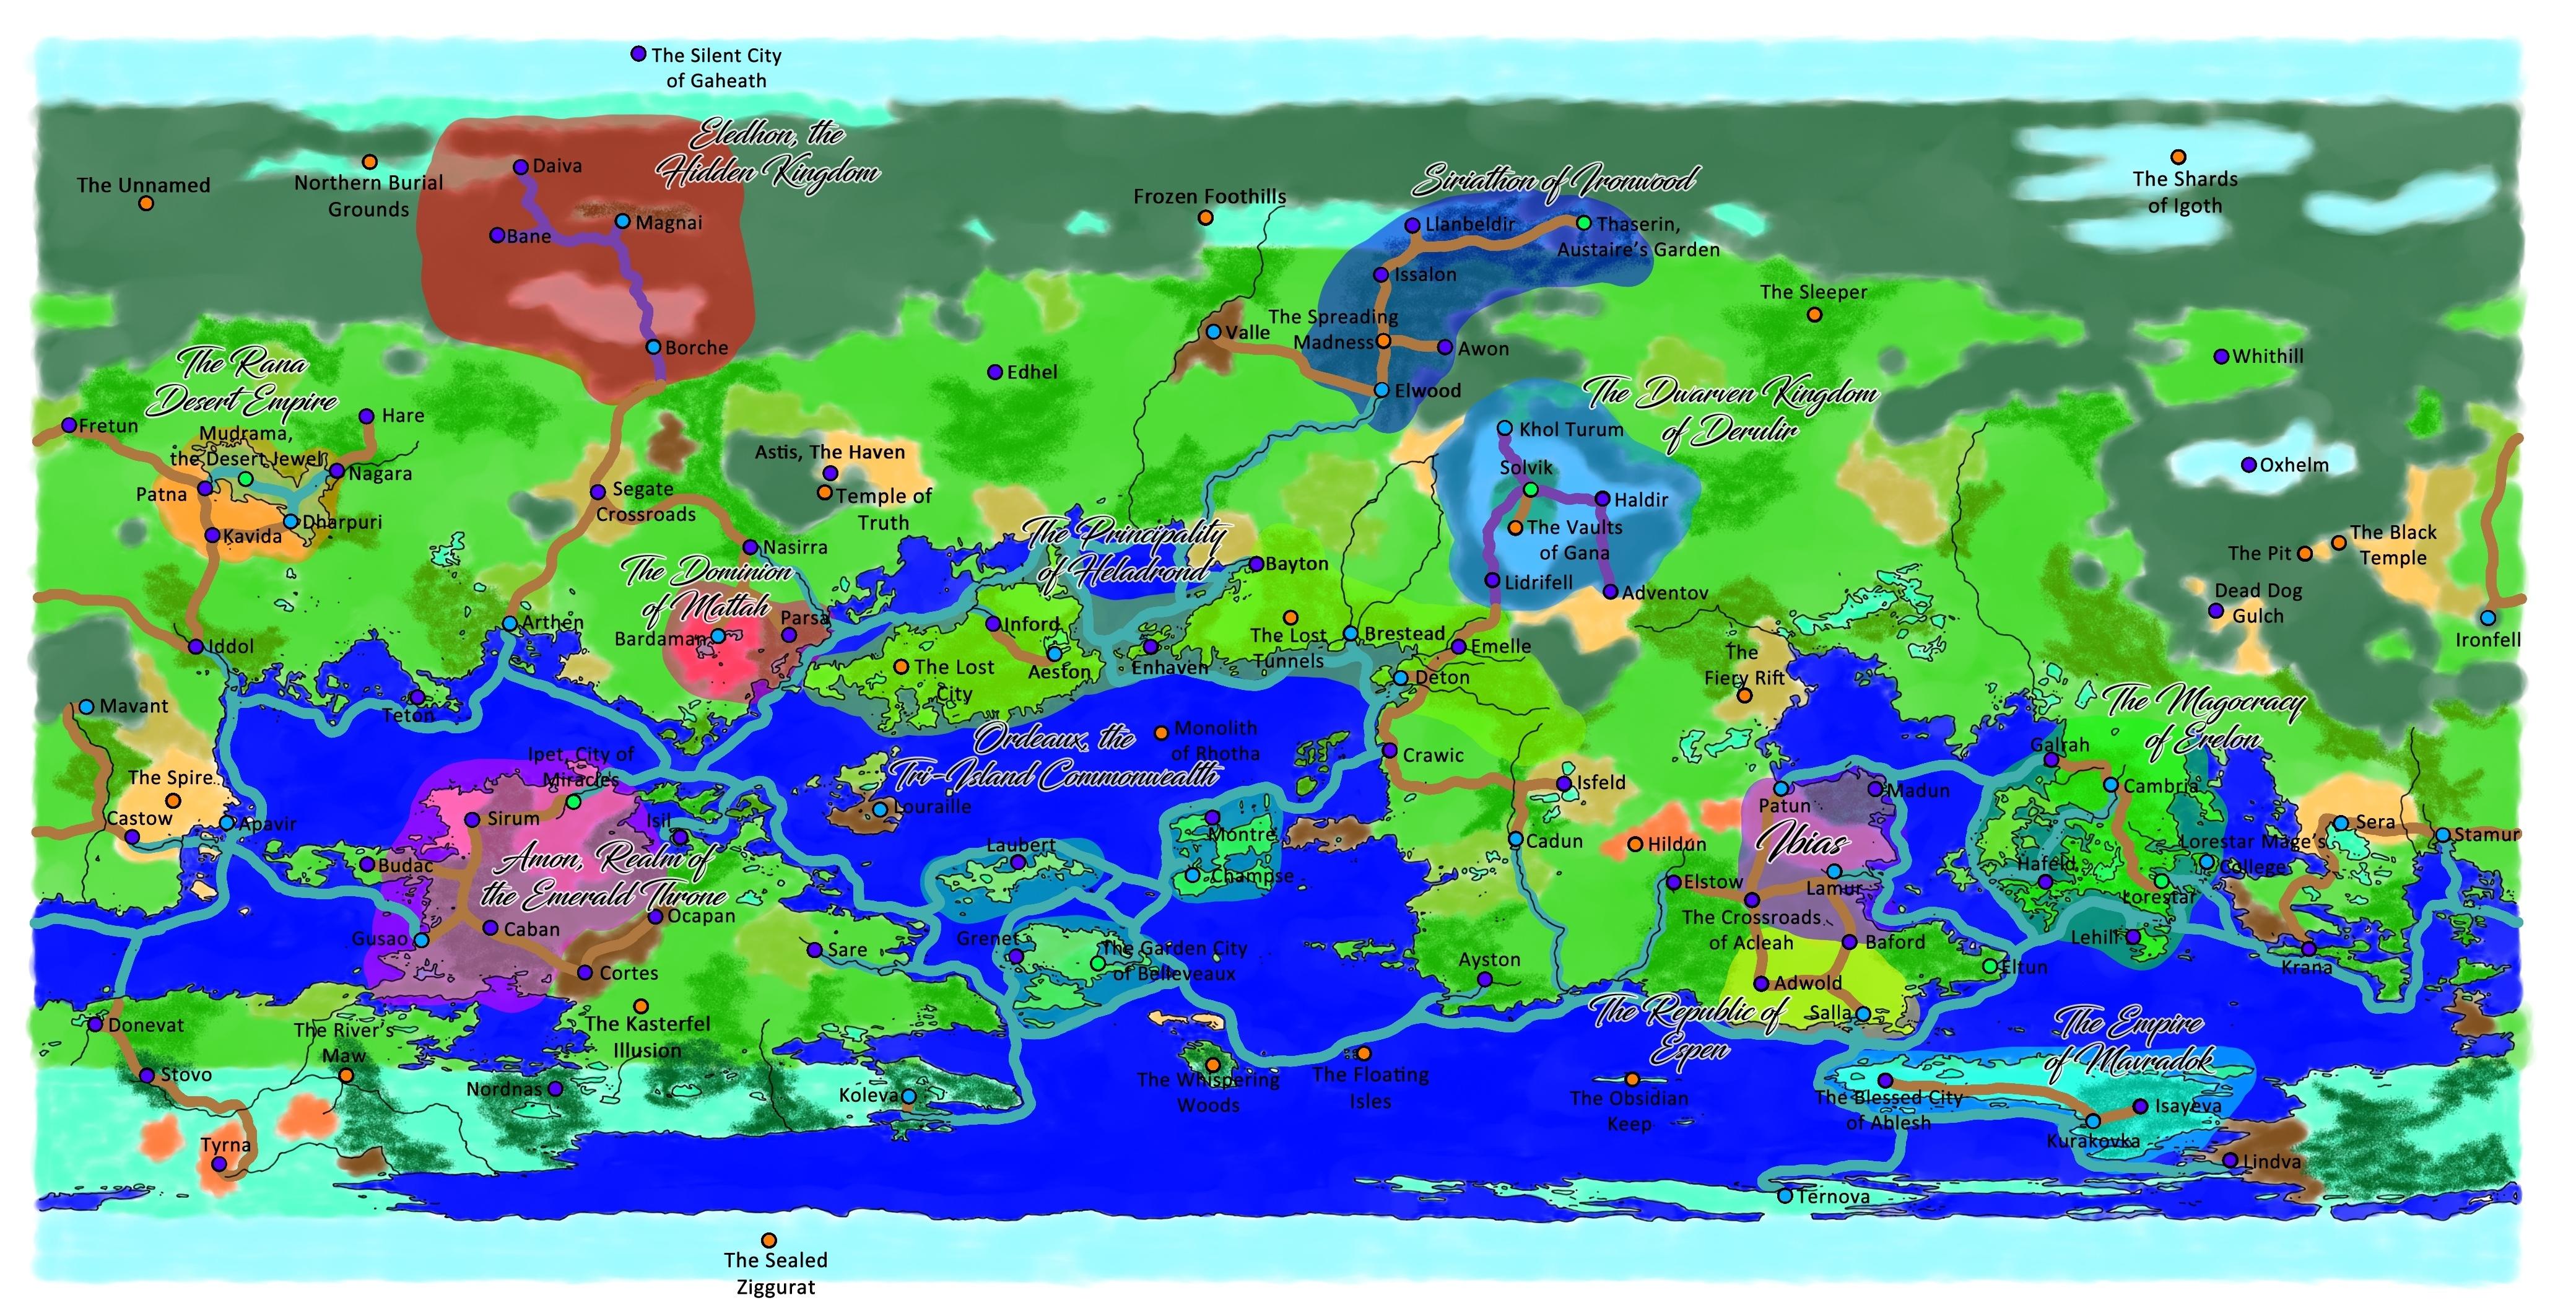 jpgazafeladventuremap2jpg4160x2112 245 mb